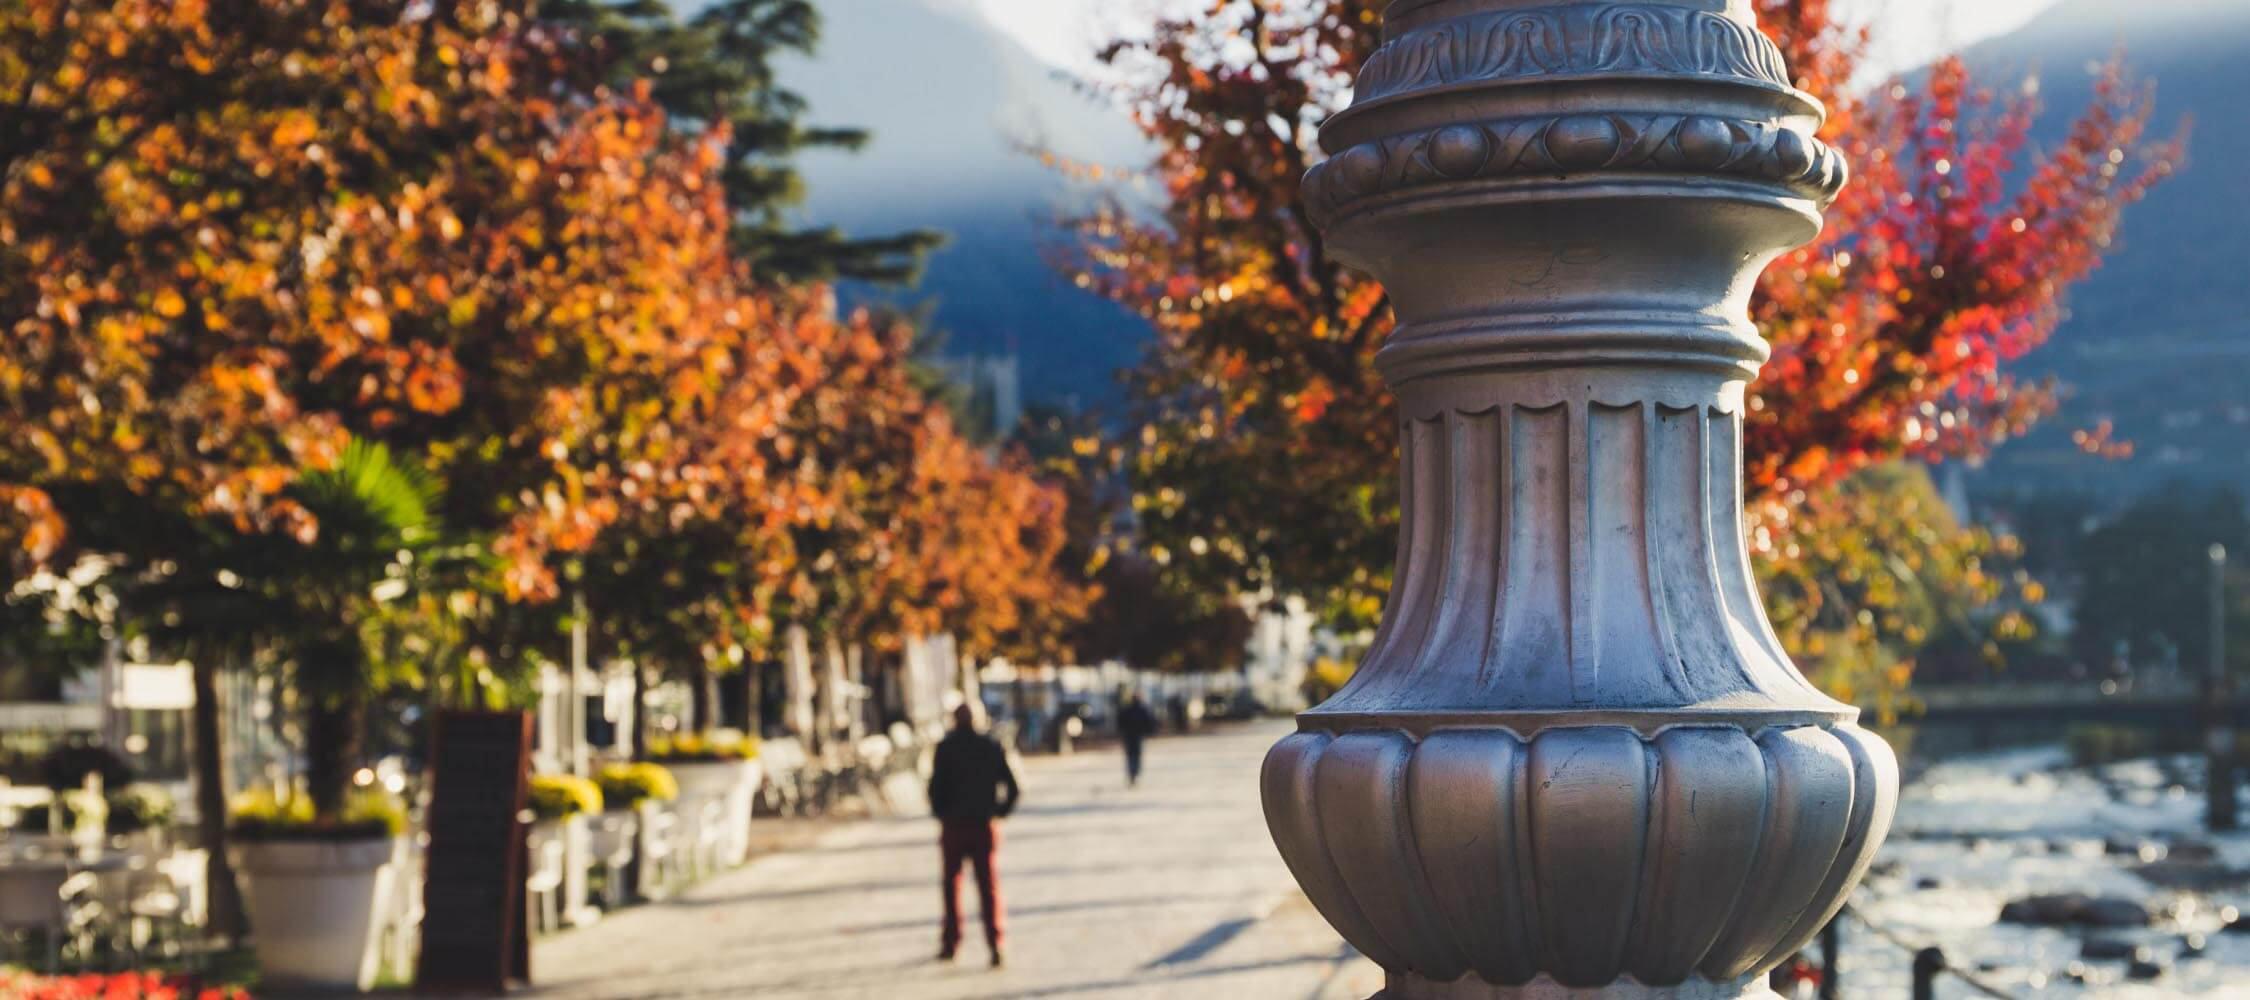 Italien-Trentino_Suedtirol_Alto_Adige_Merano_Meran_Besichtigen_Natur_Promenade_Spazieren_Herbst_Anguane_IMG_4266_2250x1000